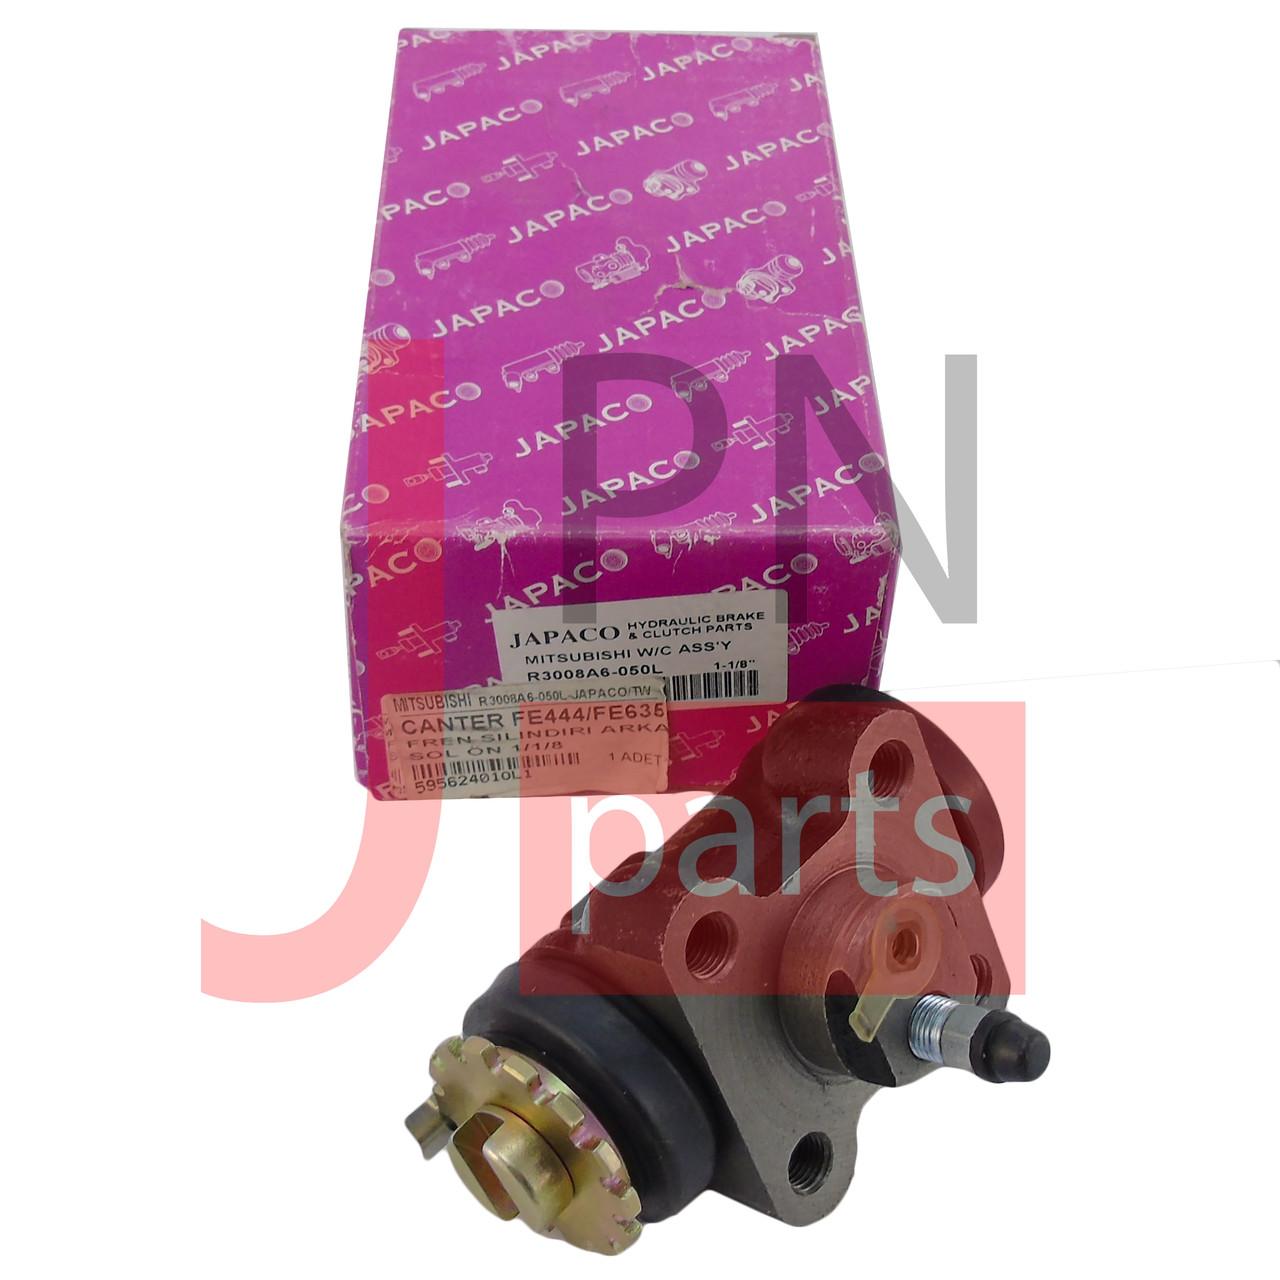 Цилиндр тормозной задний левый передний CANTER 434/444/635 (MB060580) JAPACO